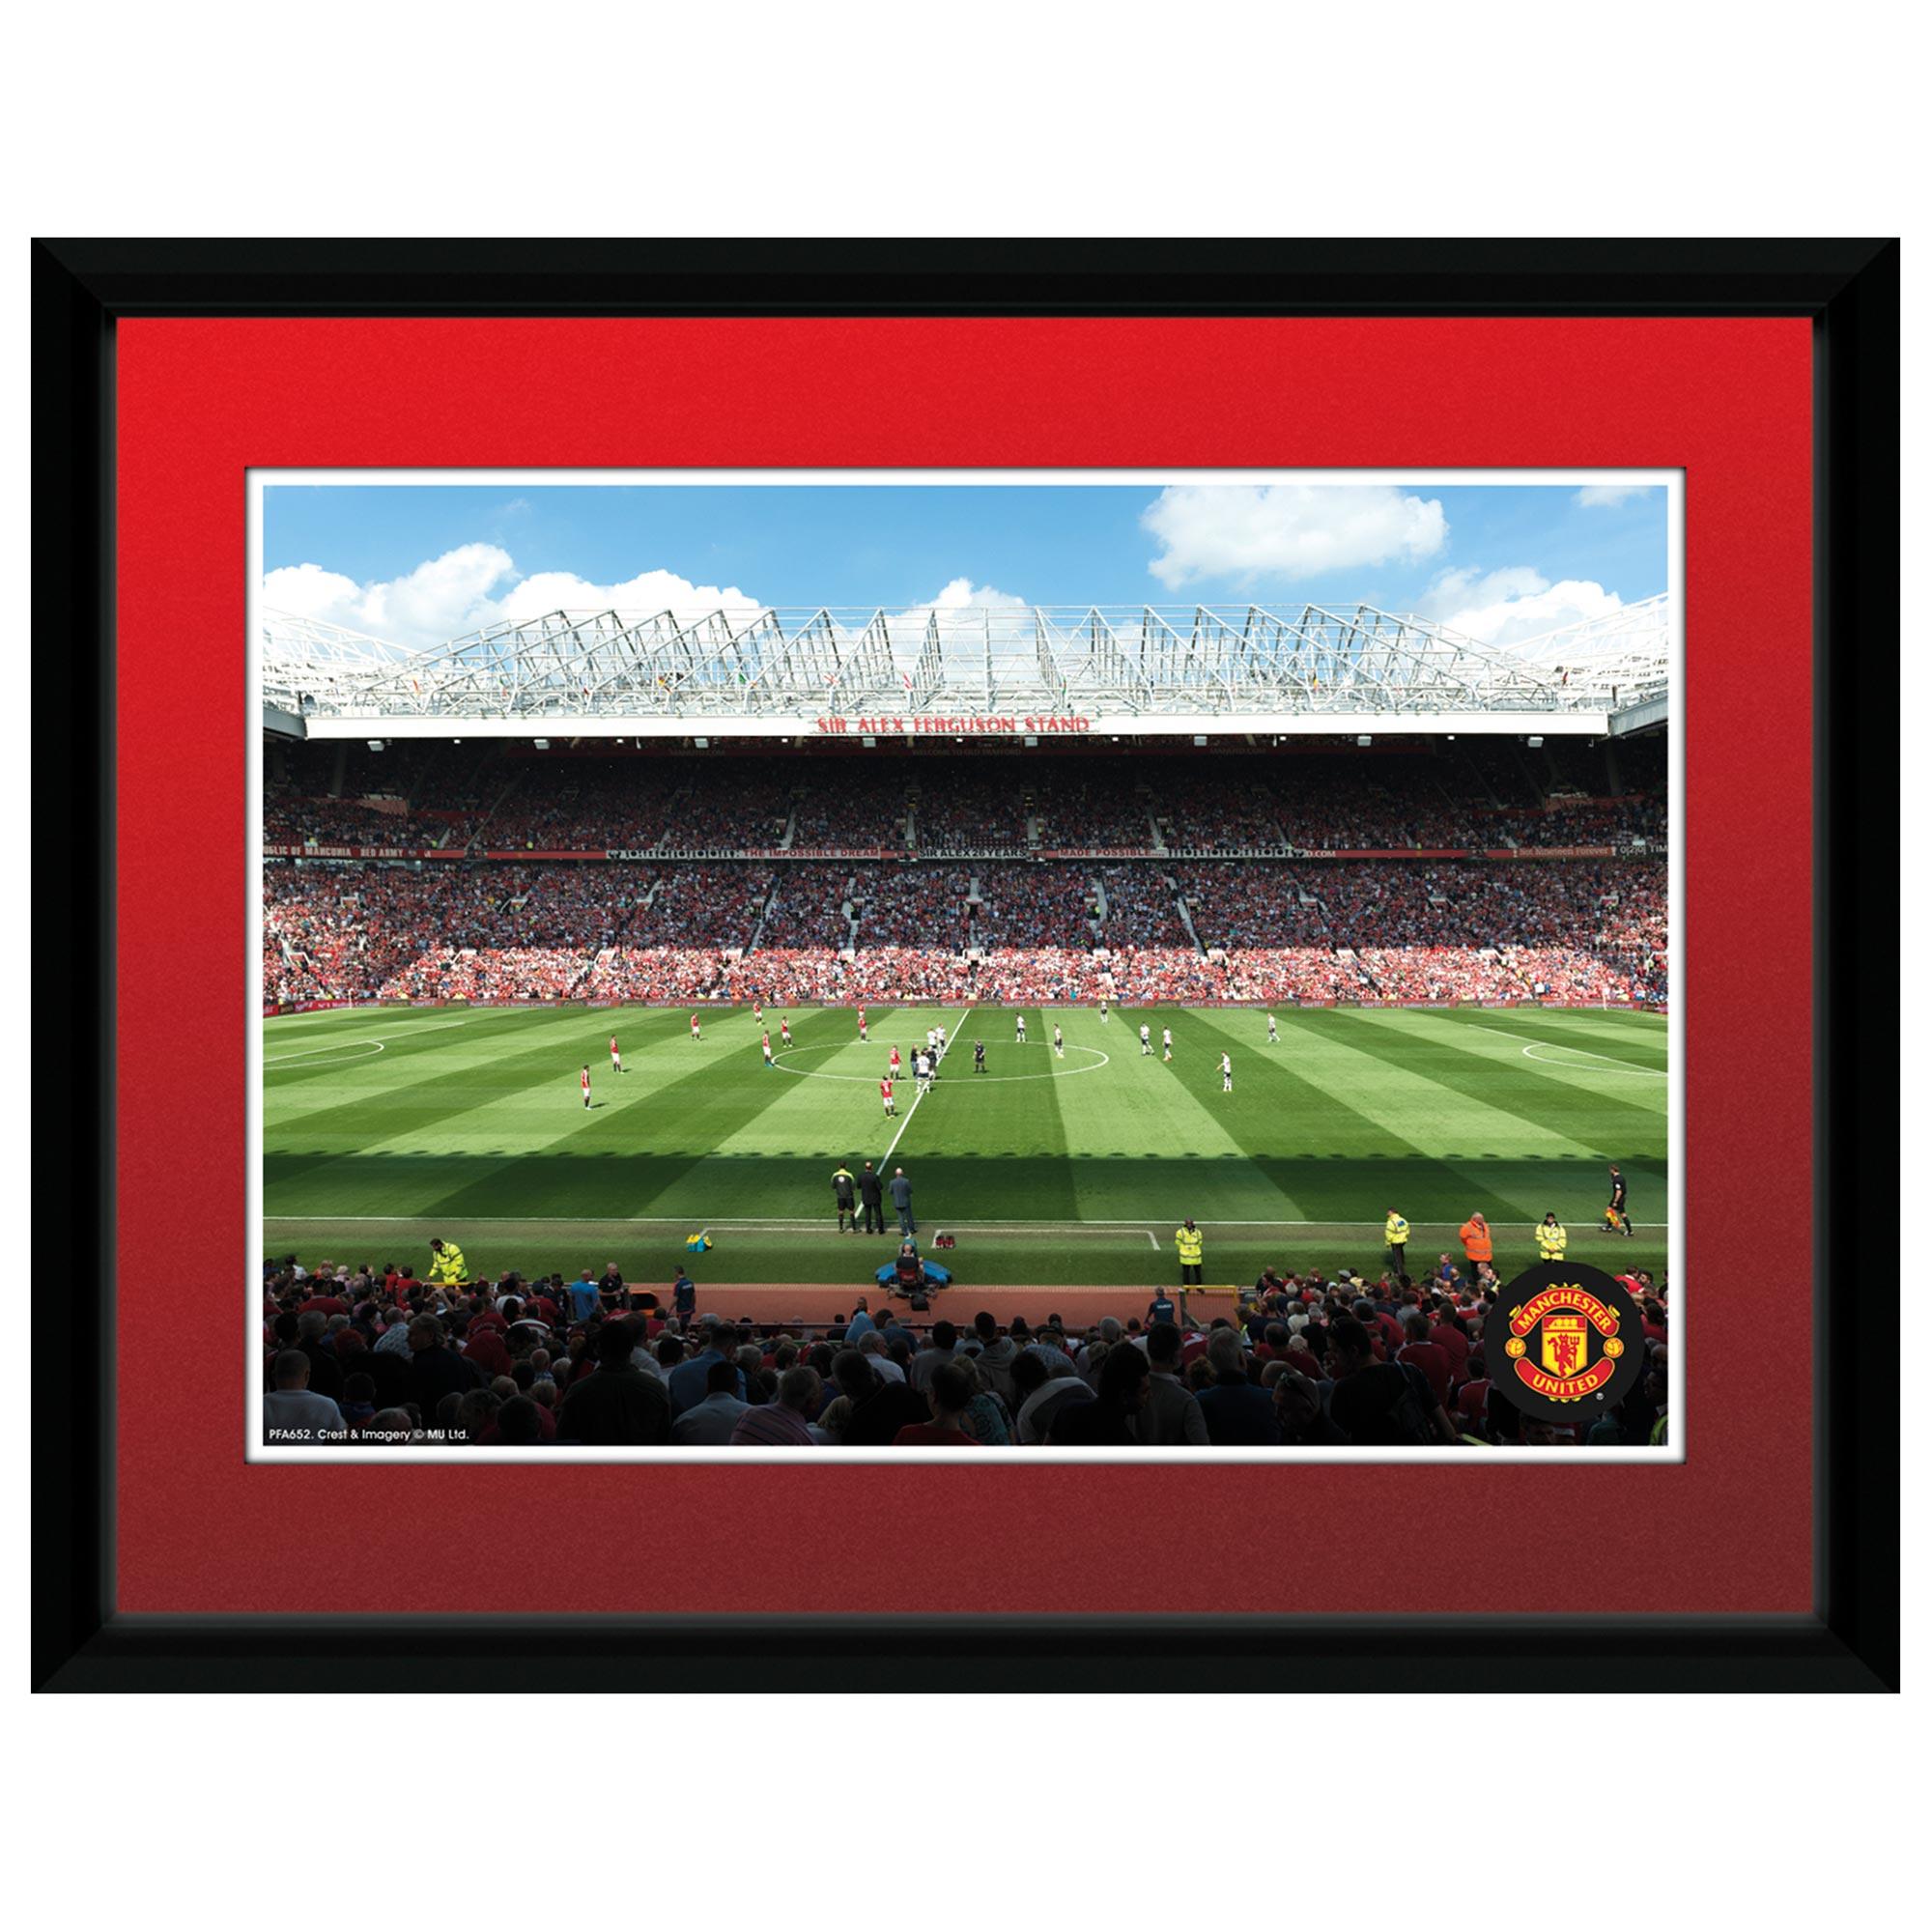 Manchester United Old Trafford Framed Print - 8 x 6 Inch